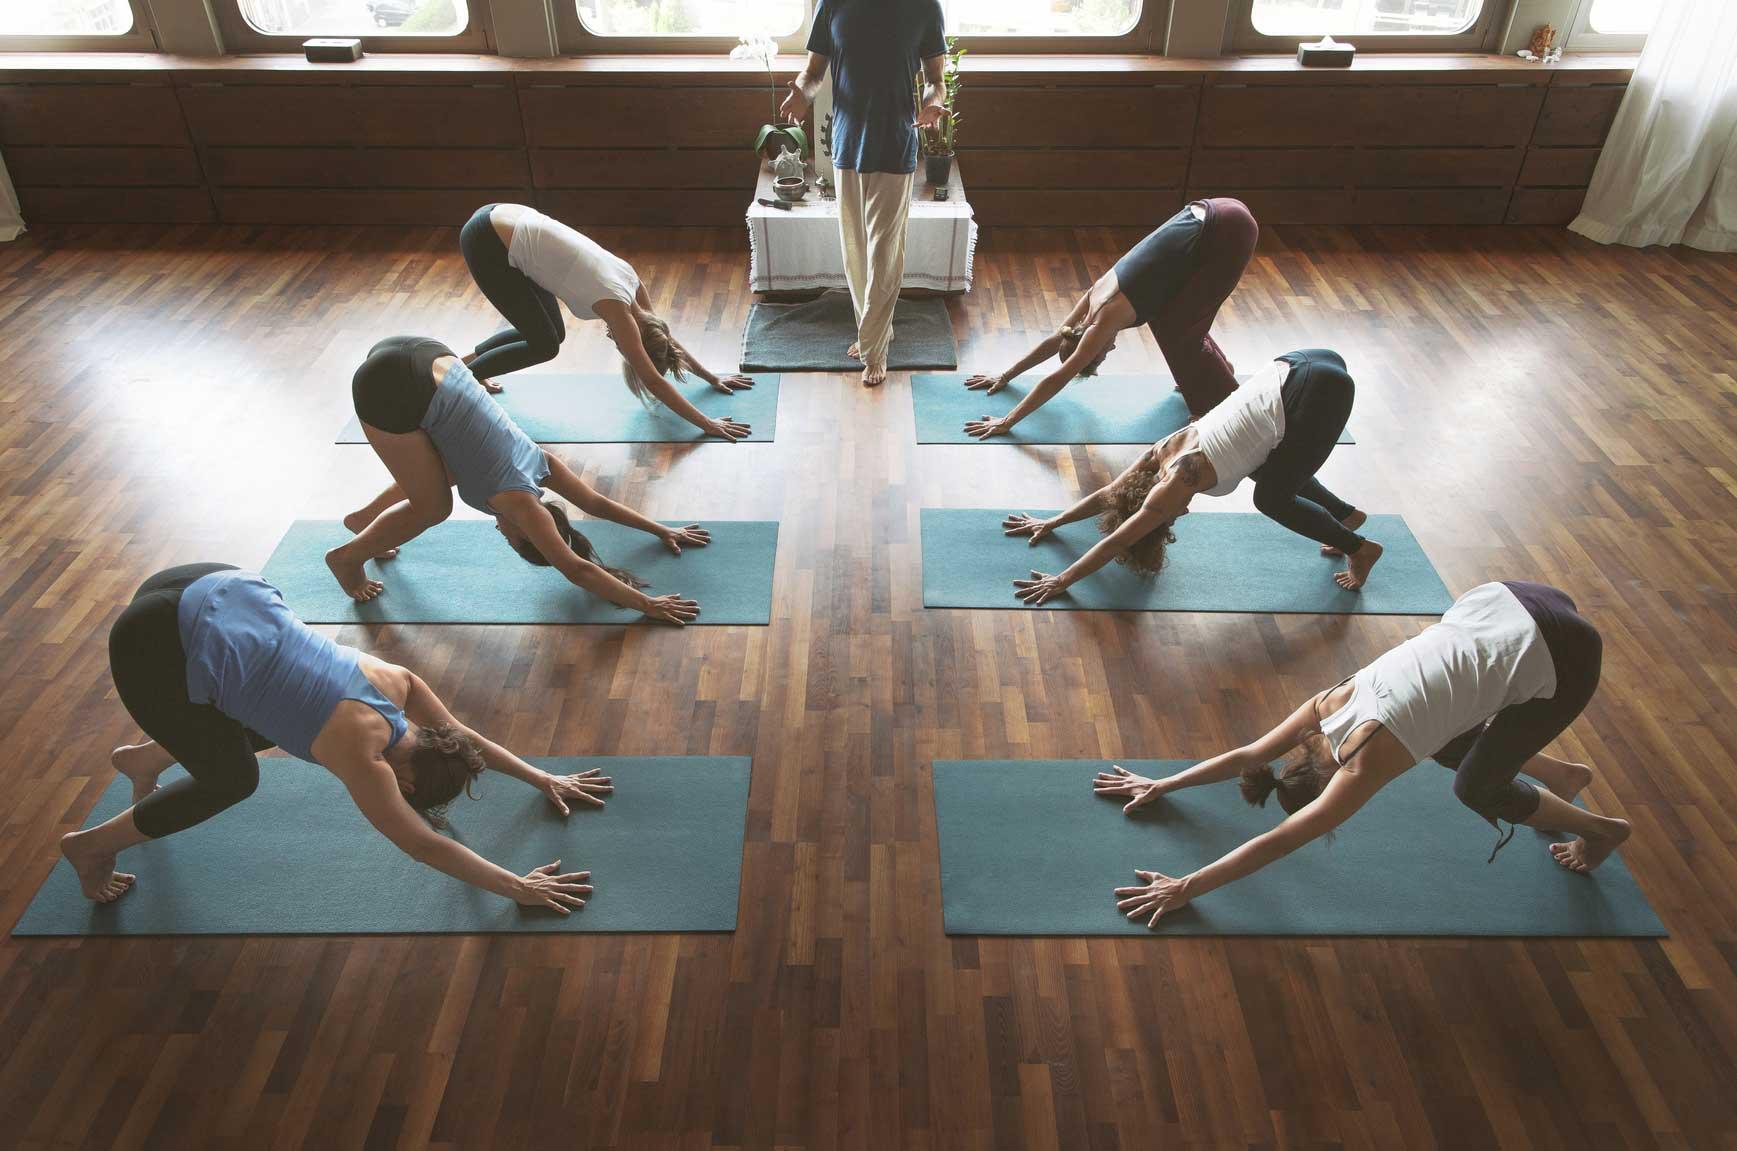 Yoga Kurs Aufbaukurs Yoga Leipzig